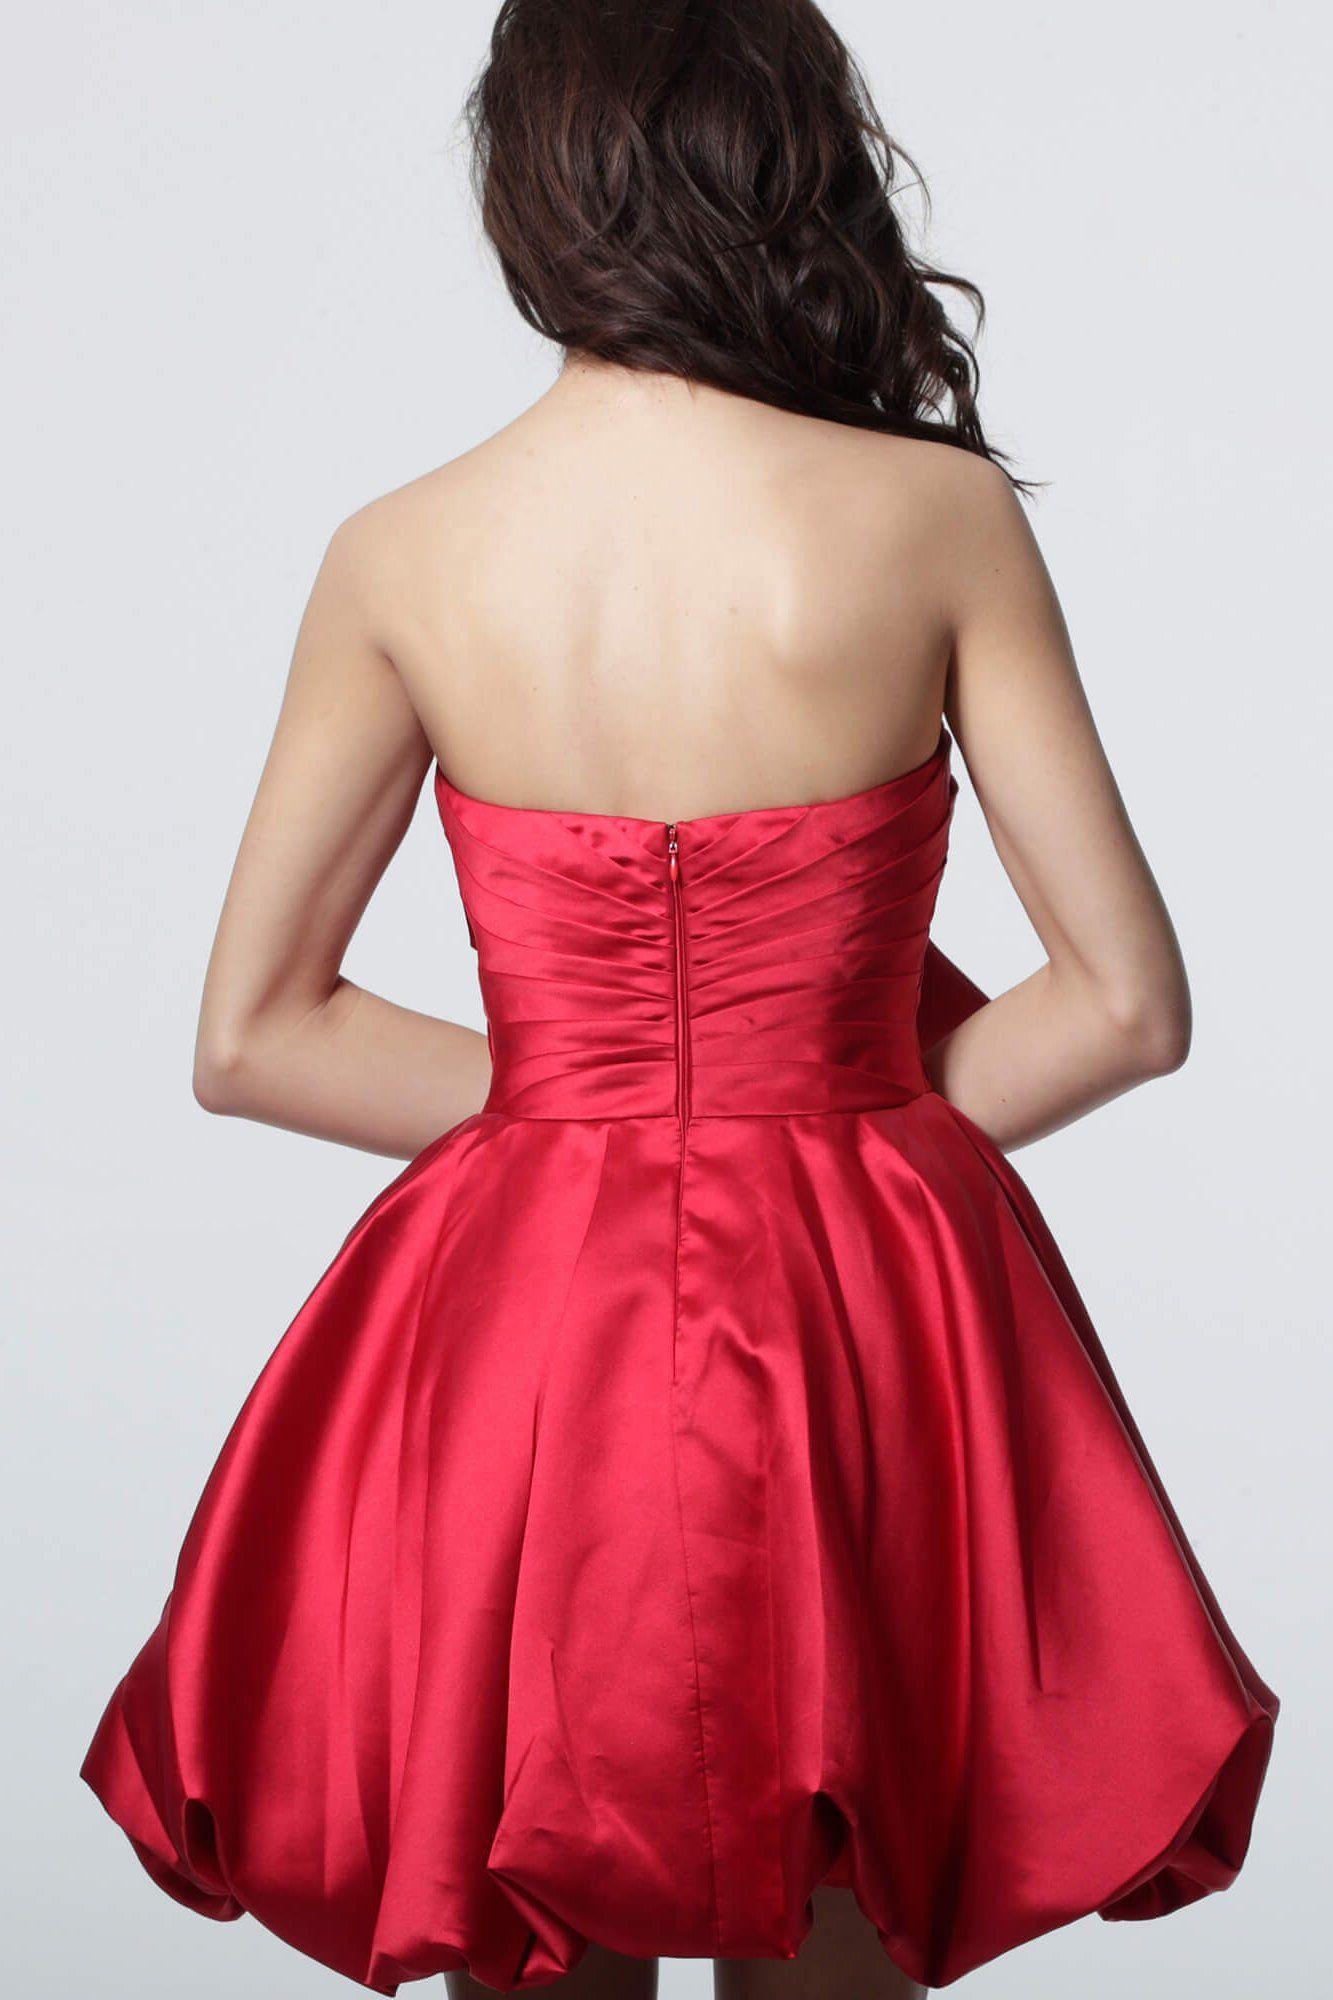 Jovani 66698 Strapless Bow Accent Bubble Skirt Cocktail Dress Bubble Skirt Strapless Homecoming Dresses Dresses [ 2000 x 1333 Pixel ]